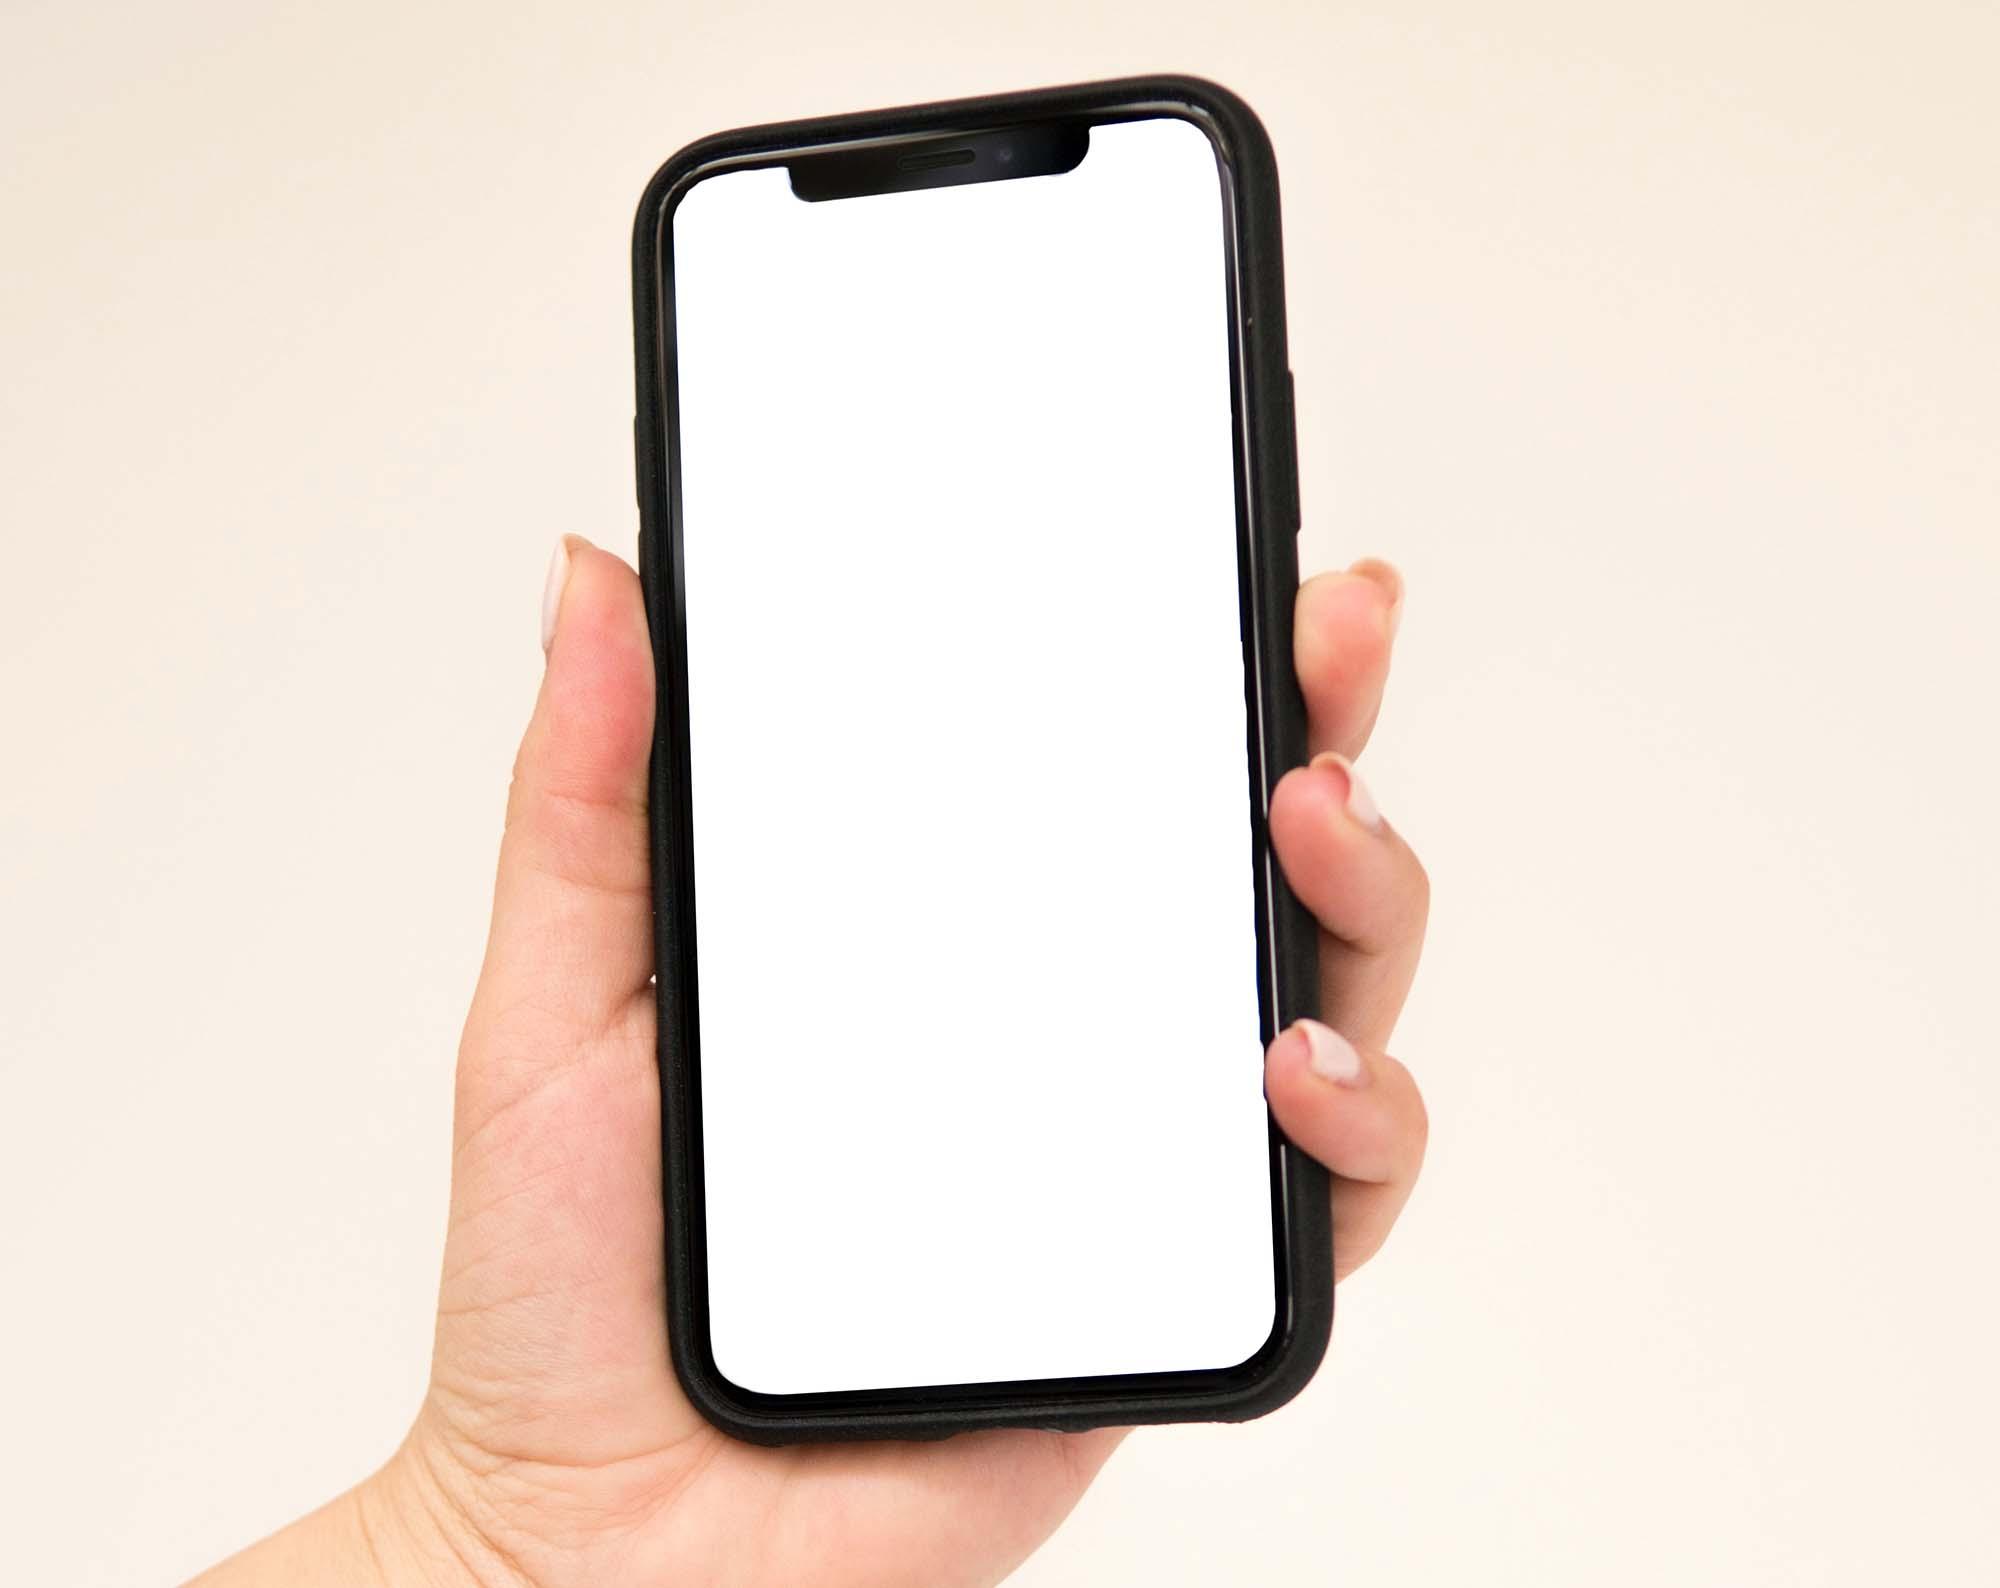 iPhone Held in Hand Mockup 2